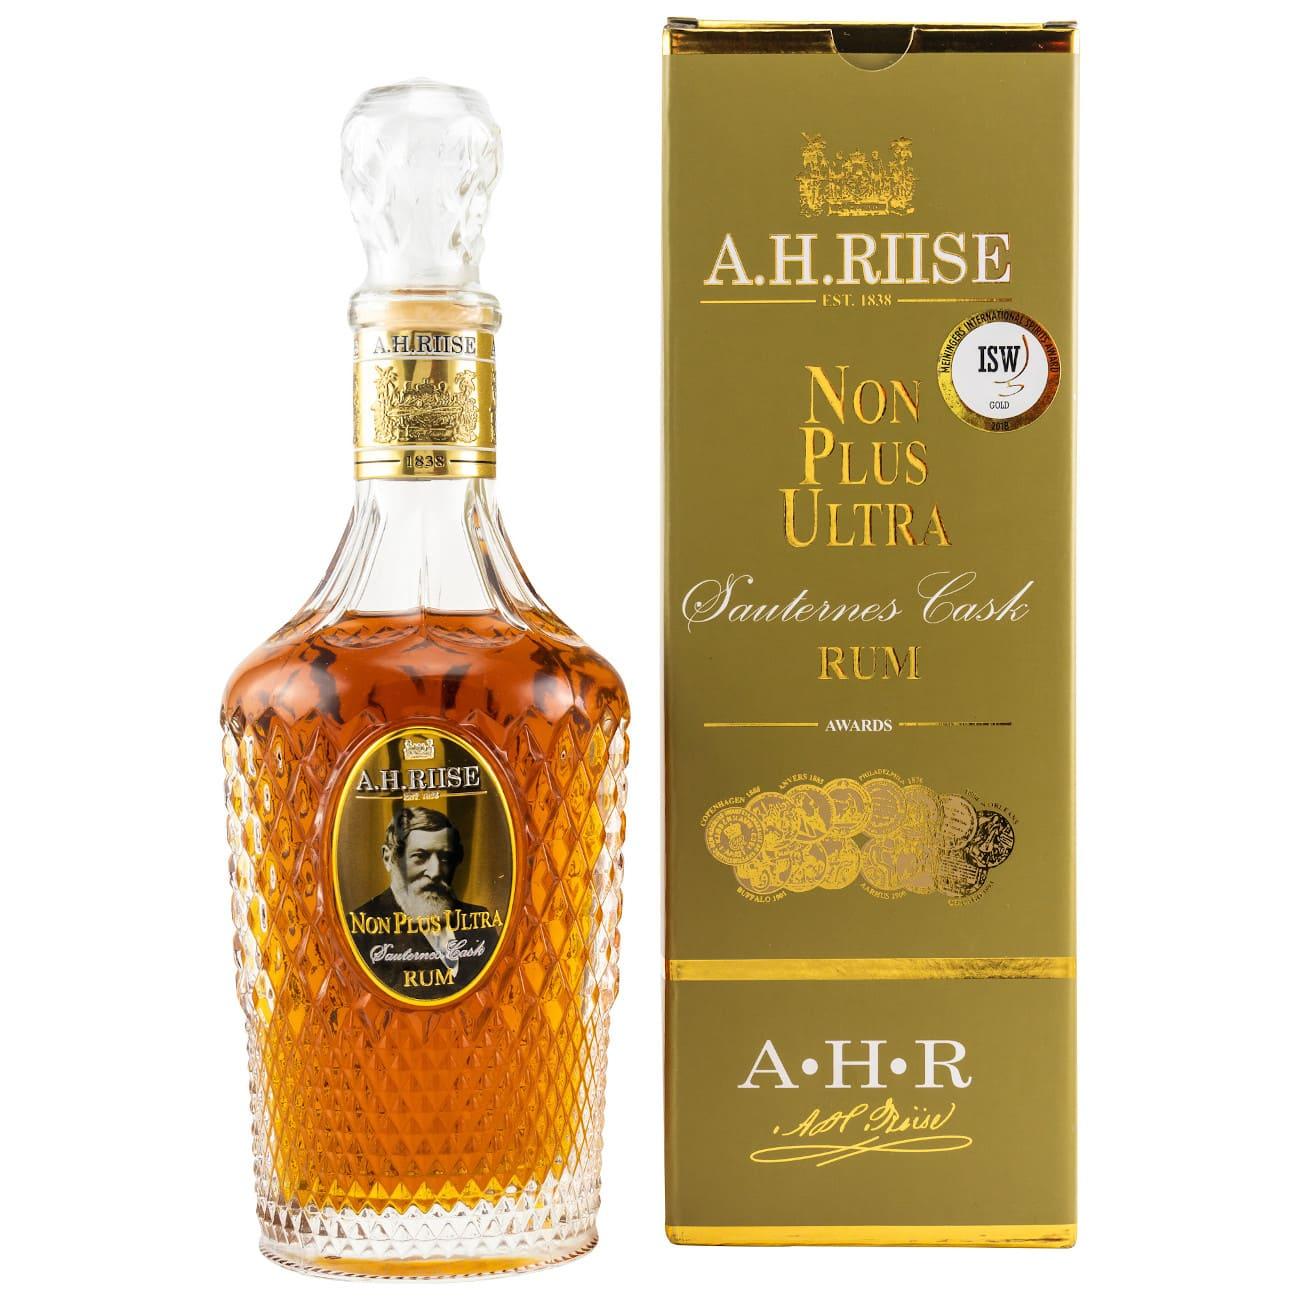 A. H. Riise Sauternes Cask Rum